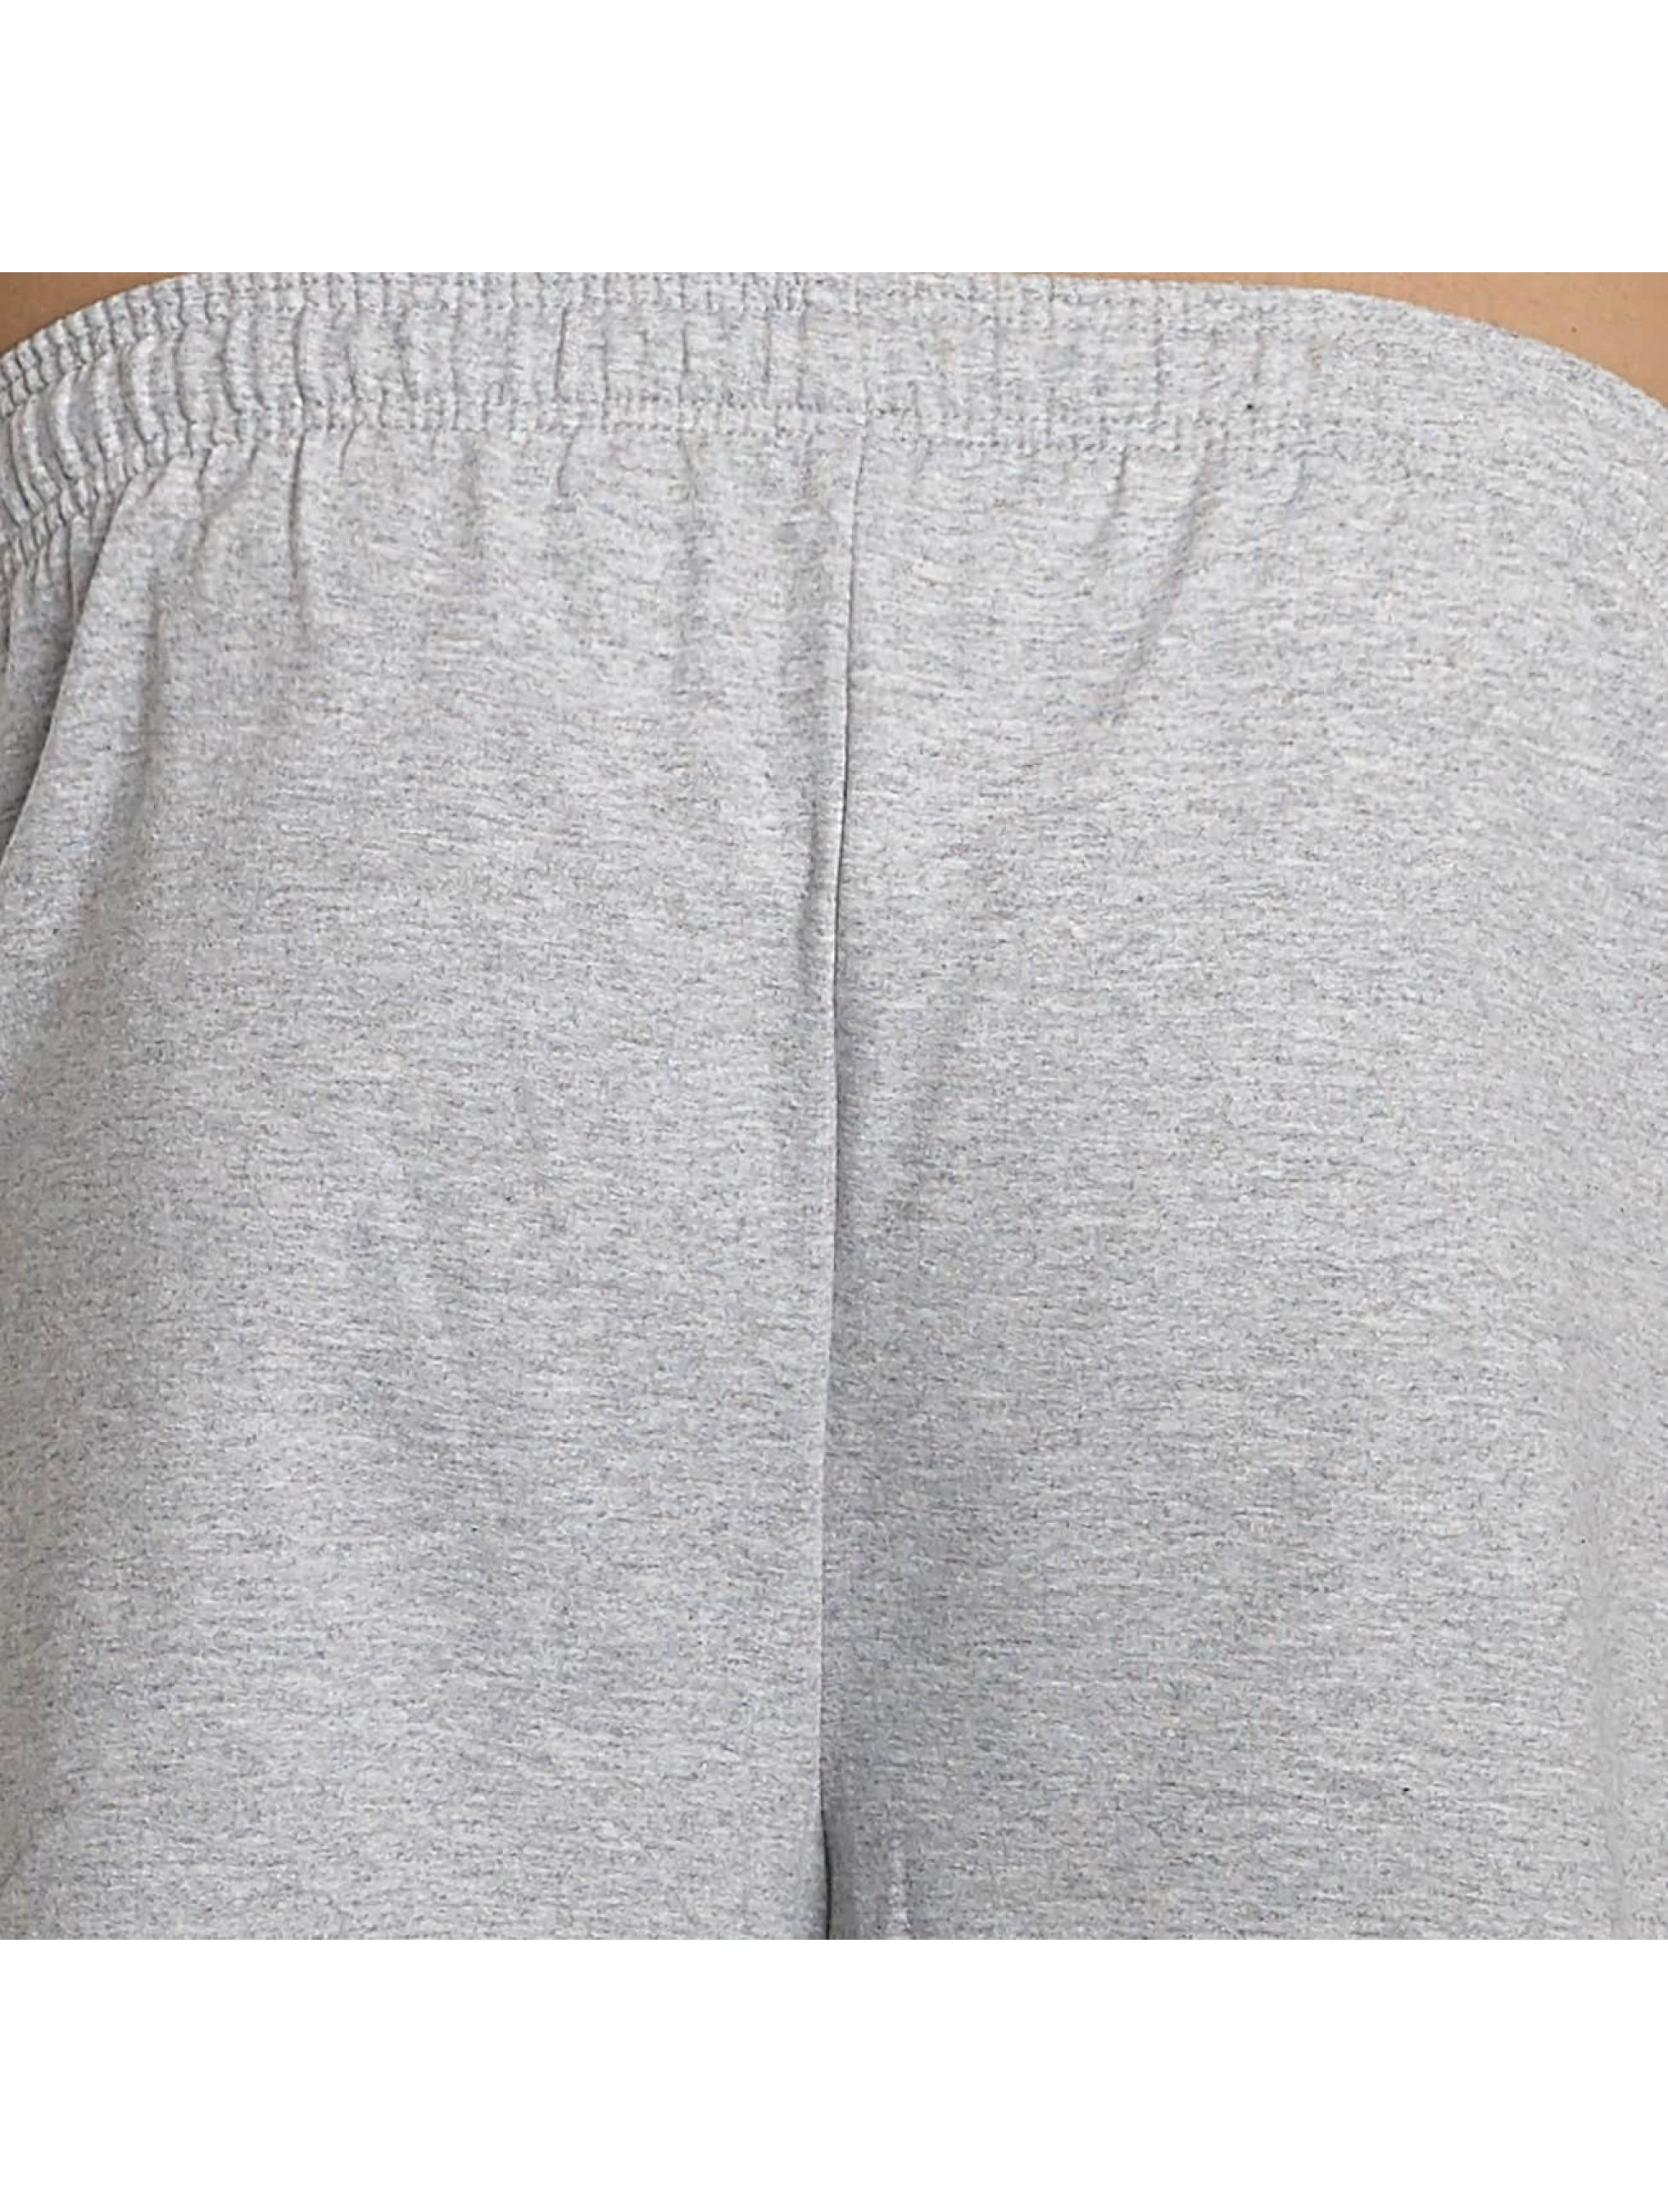 Nebbia shorts N3 grijs